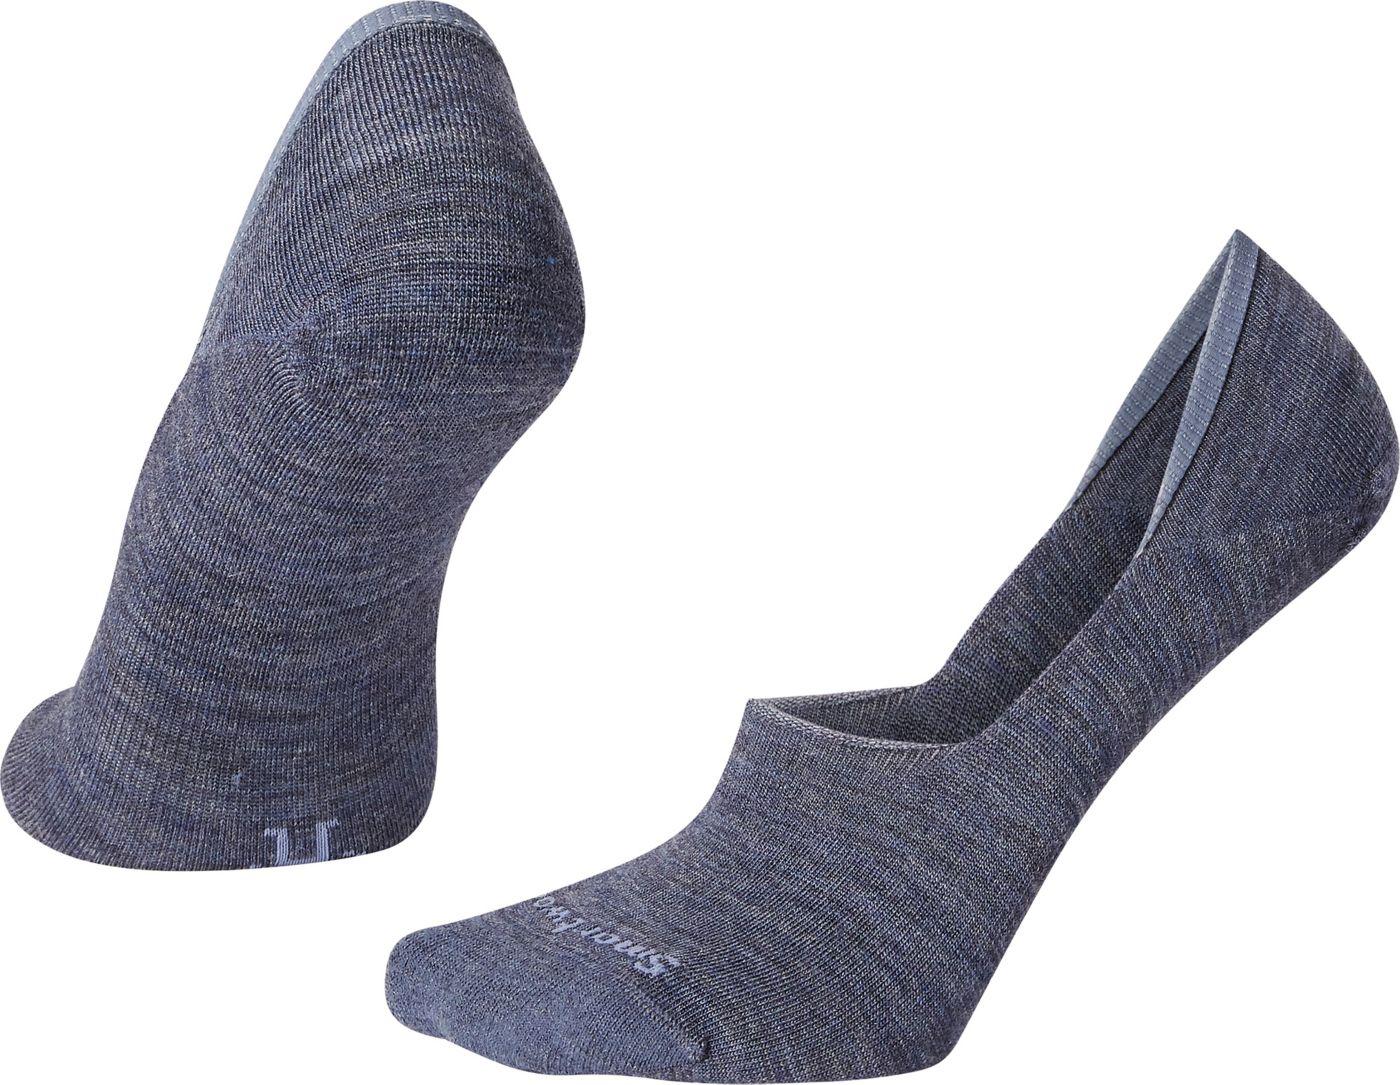 Smartwool Women's Hide and Seek No Show Socks